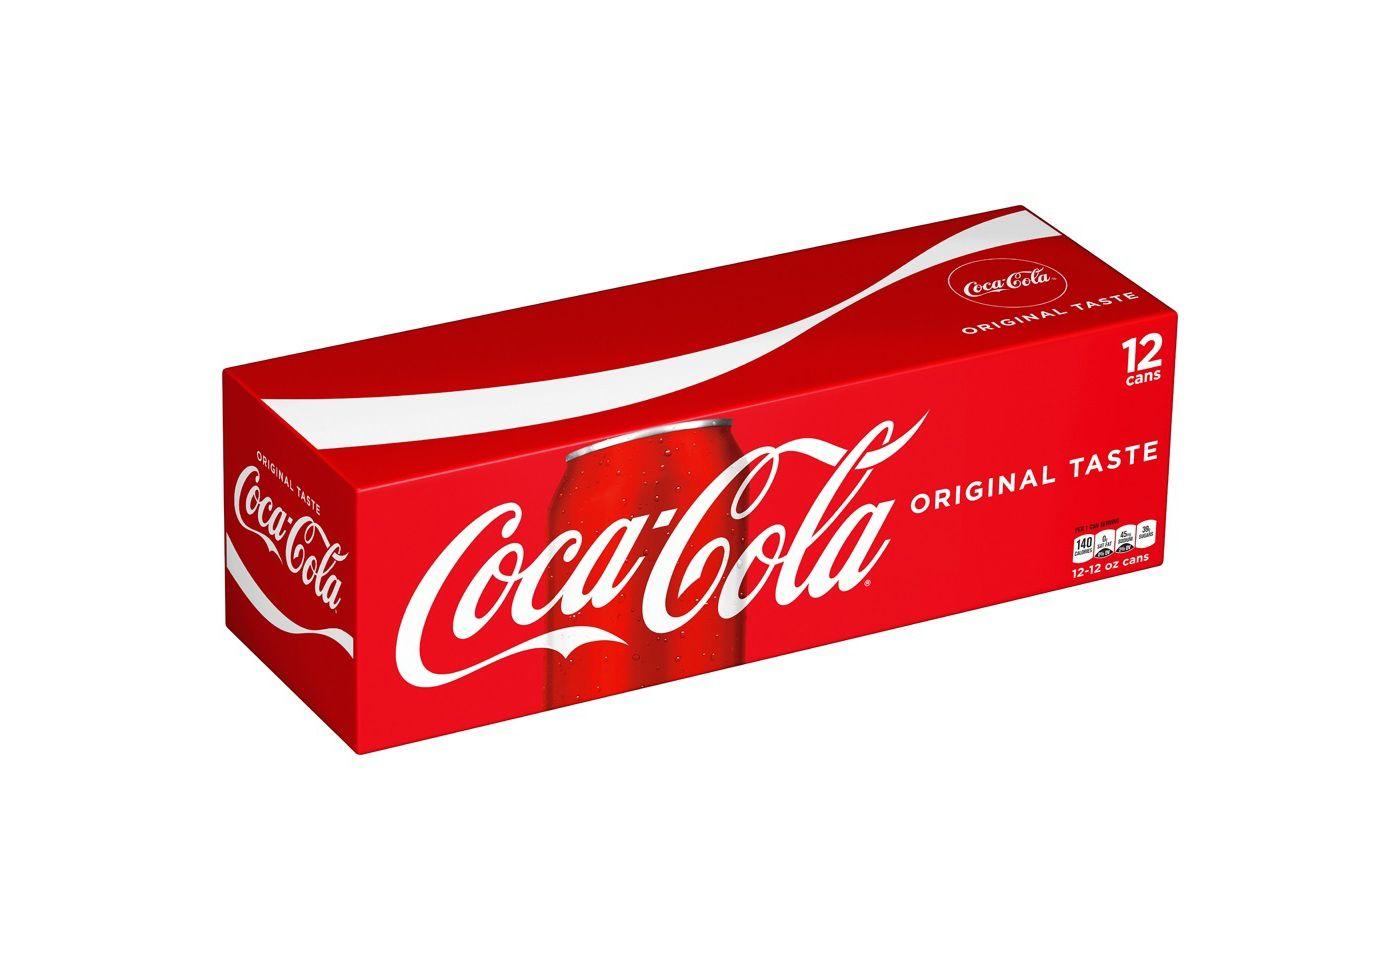 3 X 12-Pack 12 oz. Soda (Coke, Pepsi, Sprite & More)